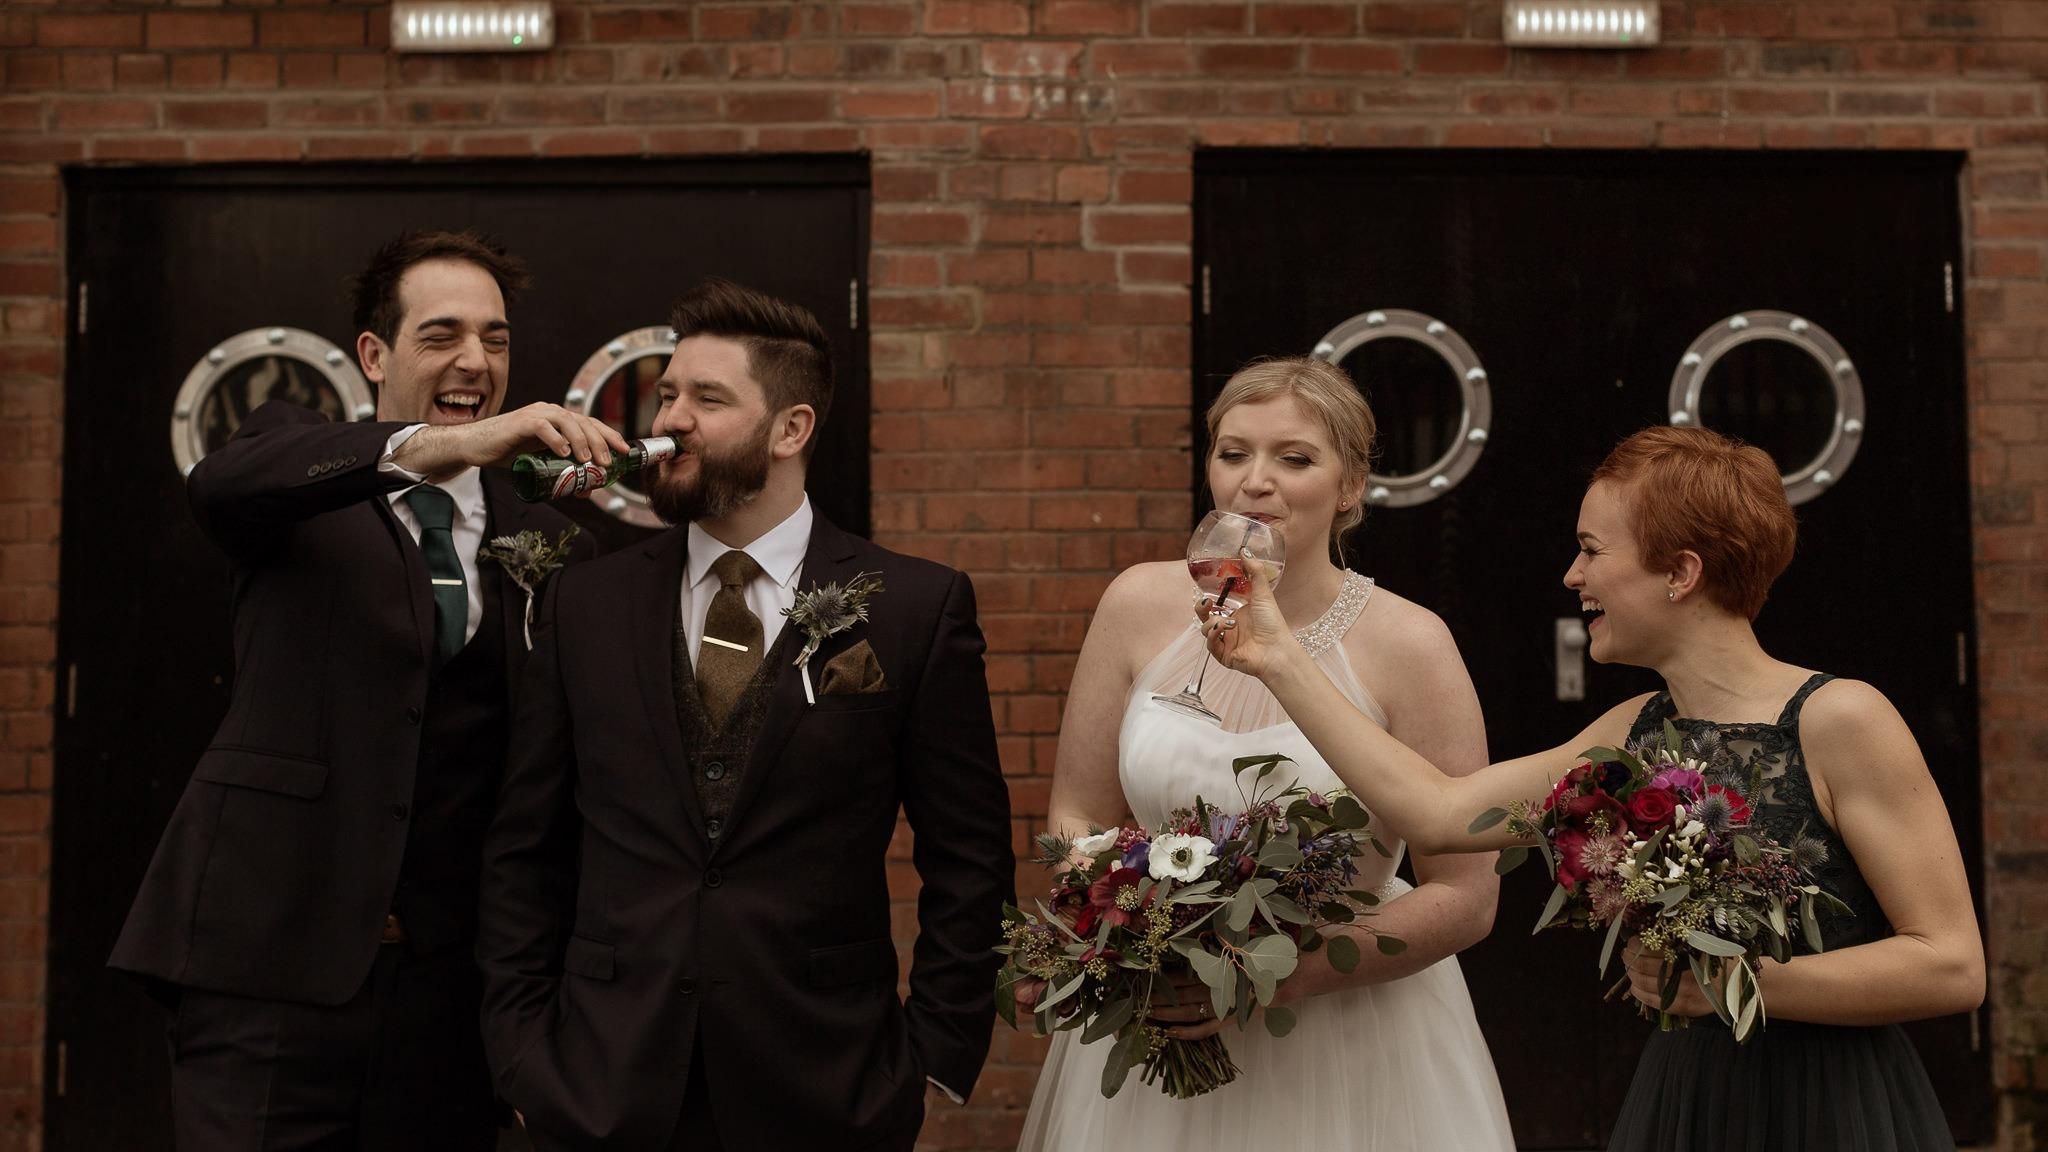 South Farm, Cambridgeshire Wedding Photography